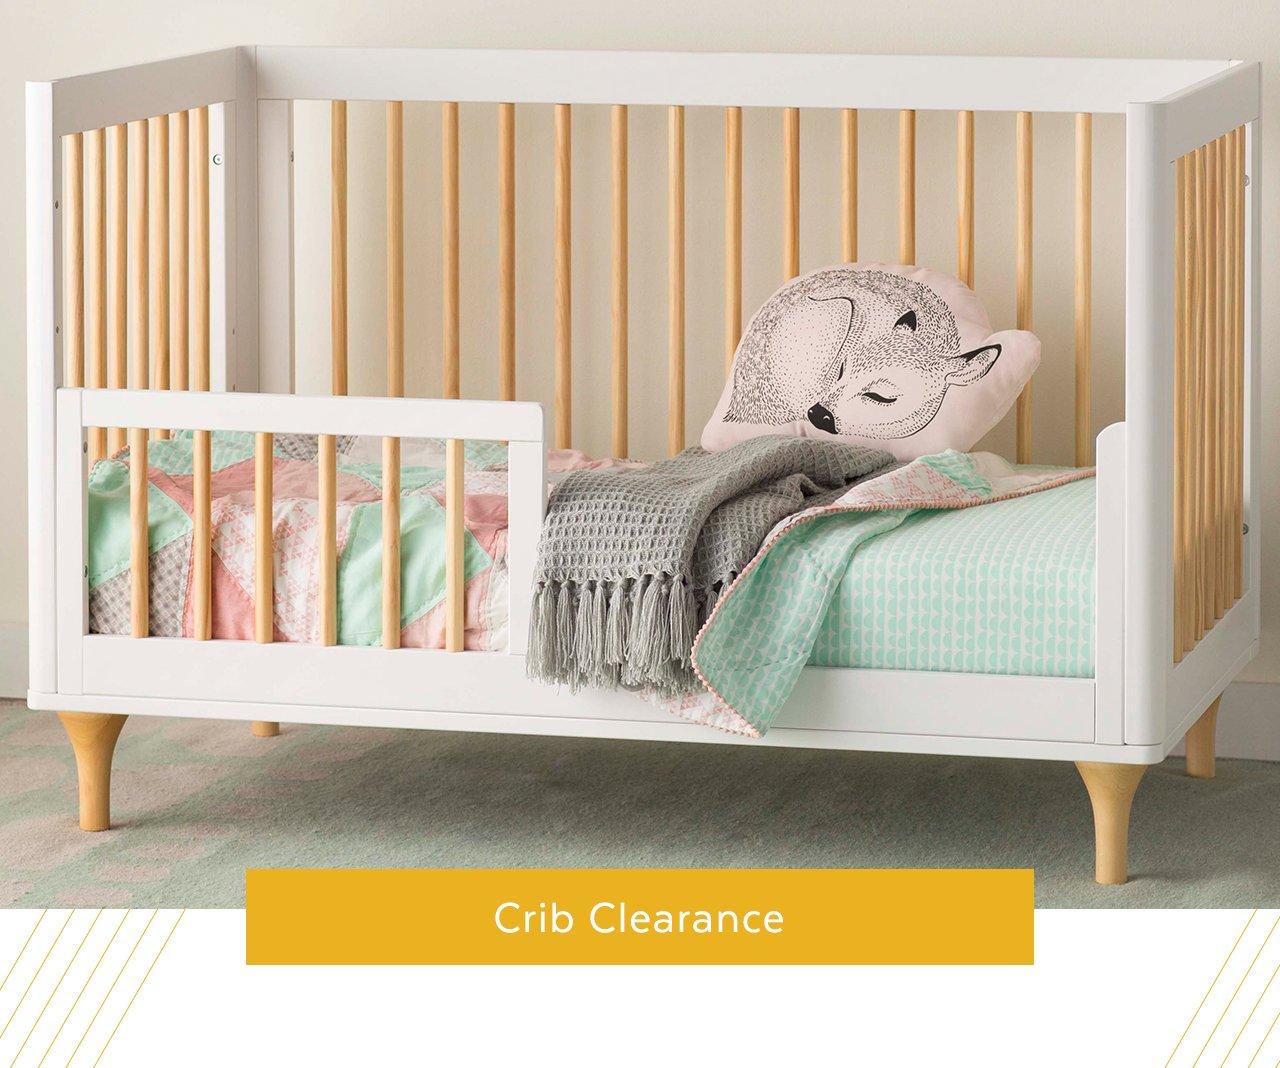 Crib Clearance